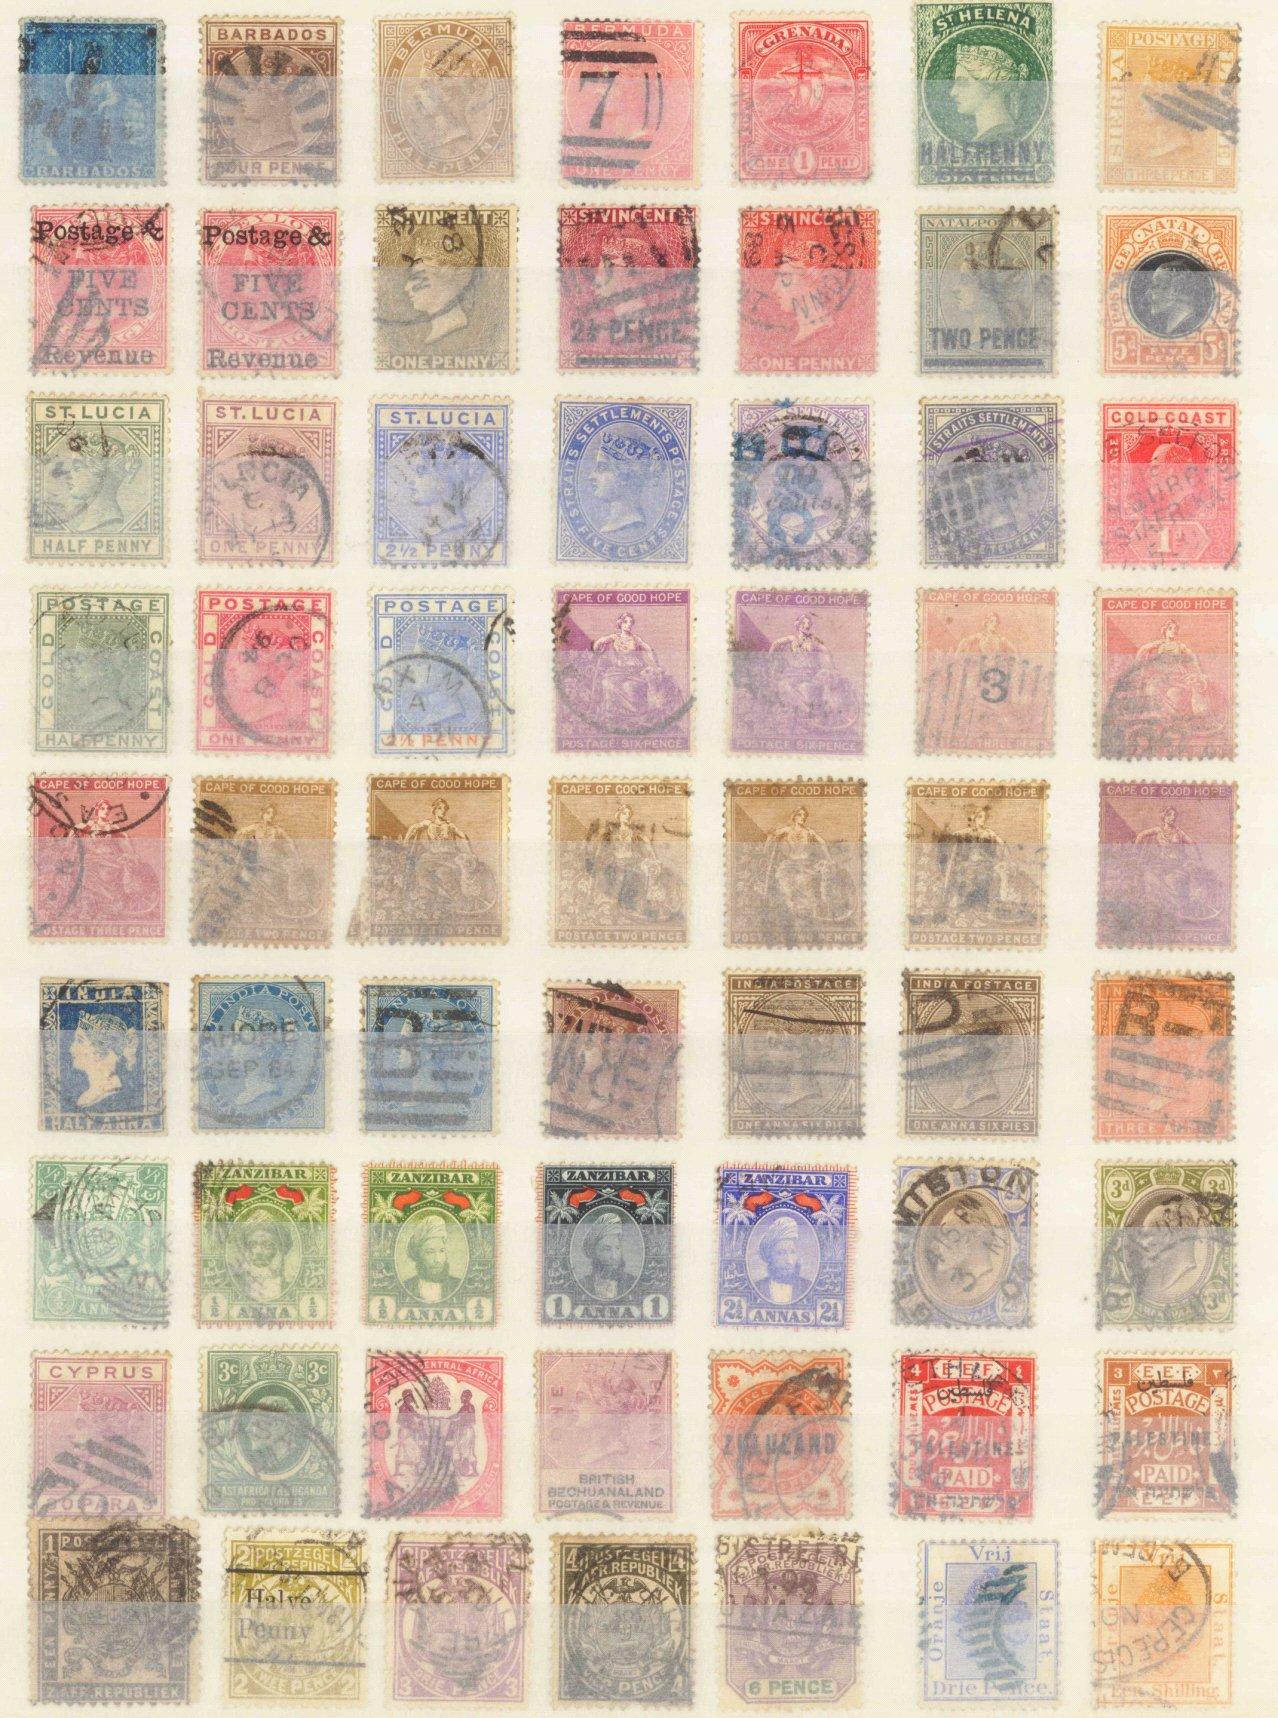 BRITISCHE KOLONIEN, klassische Marken ab 1860